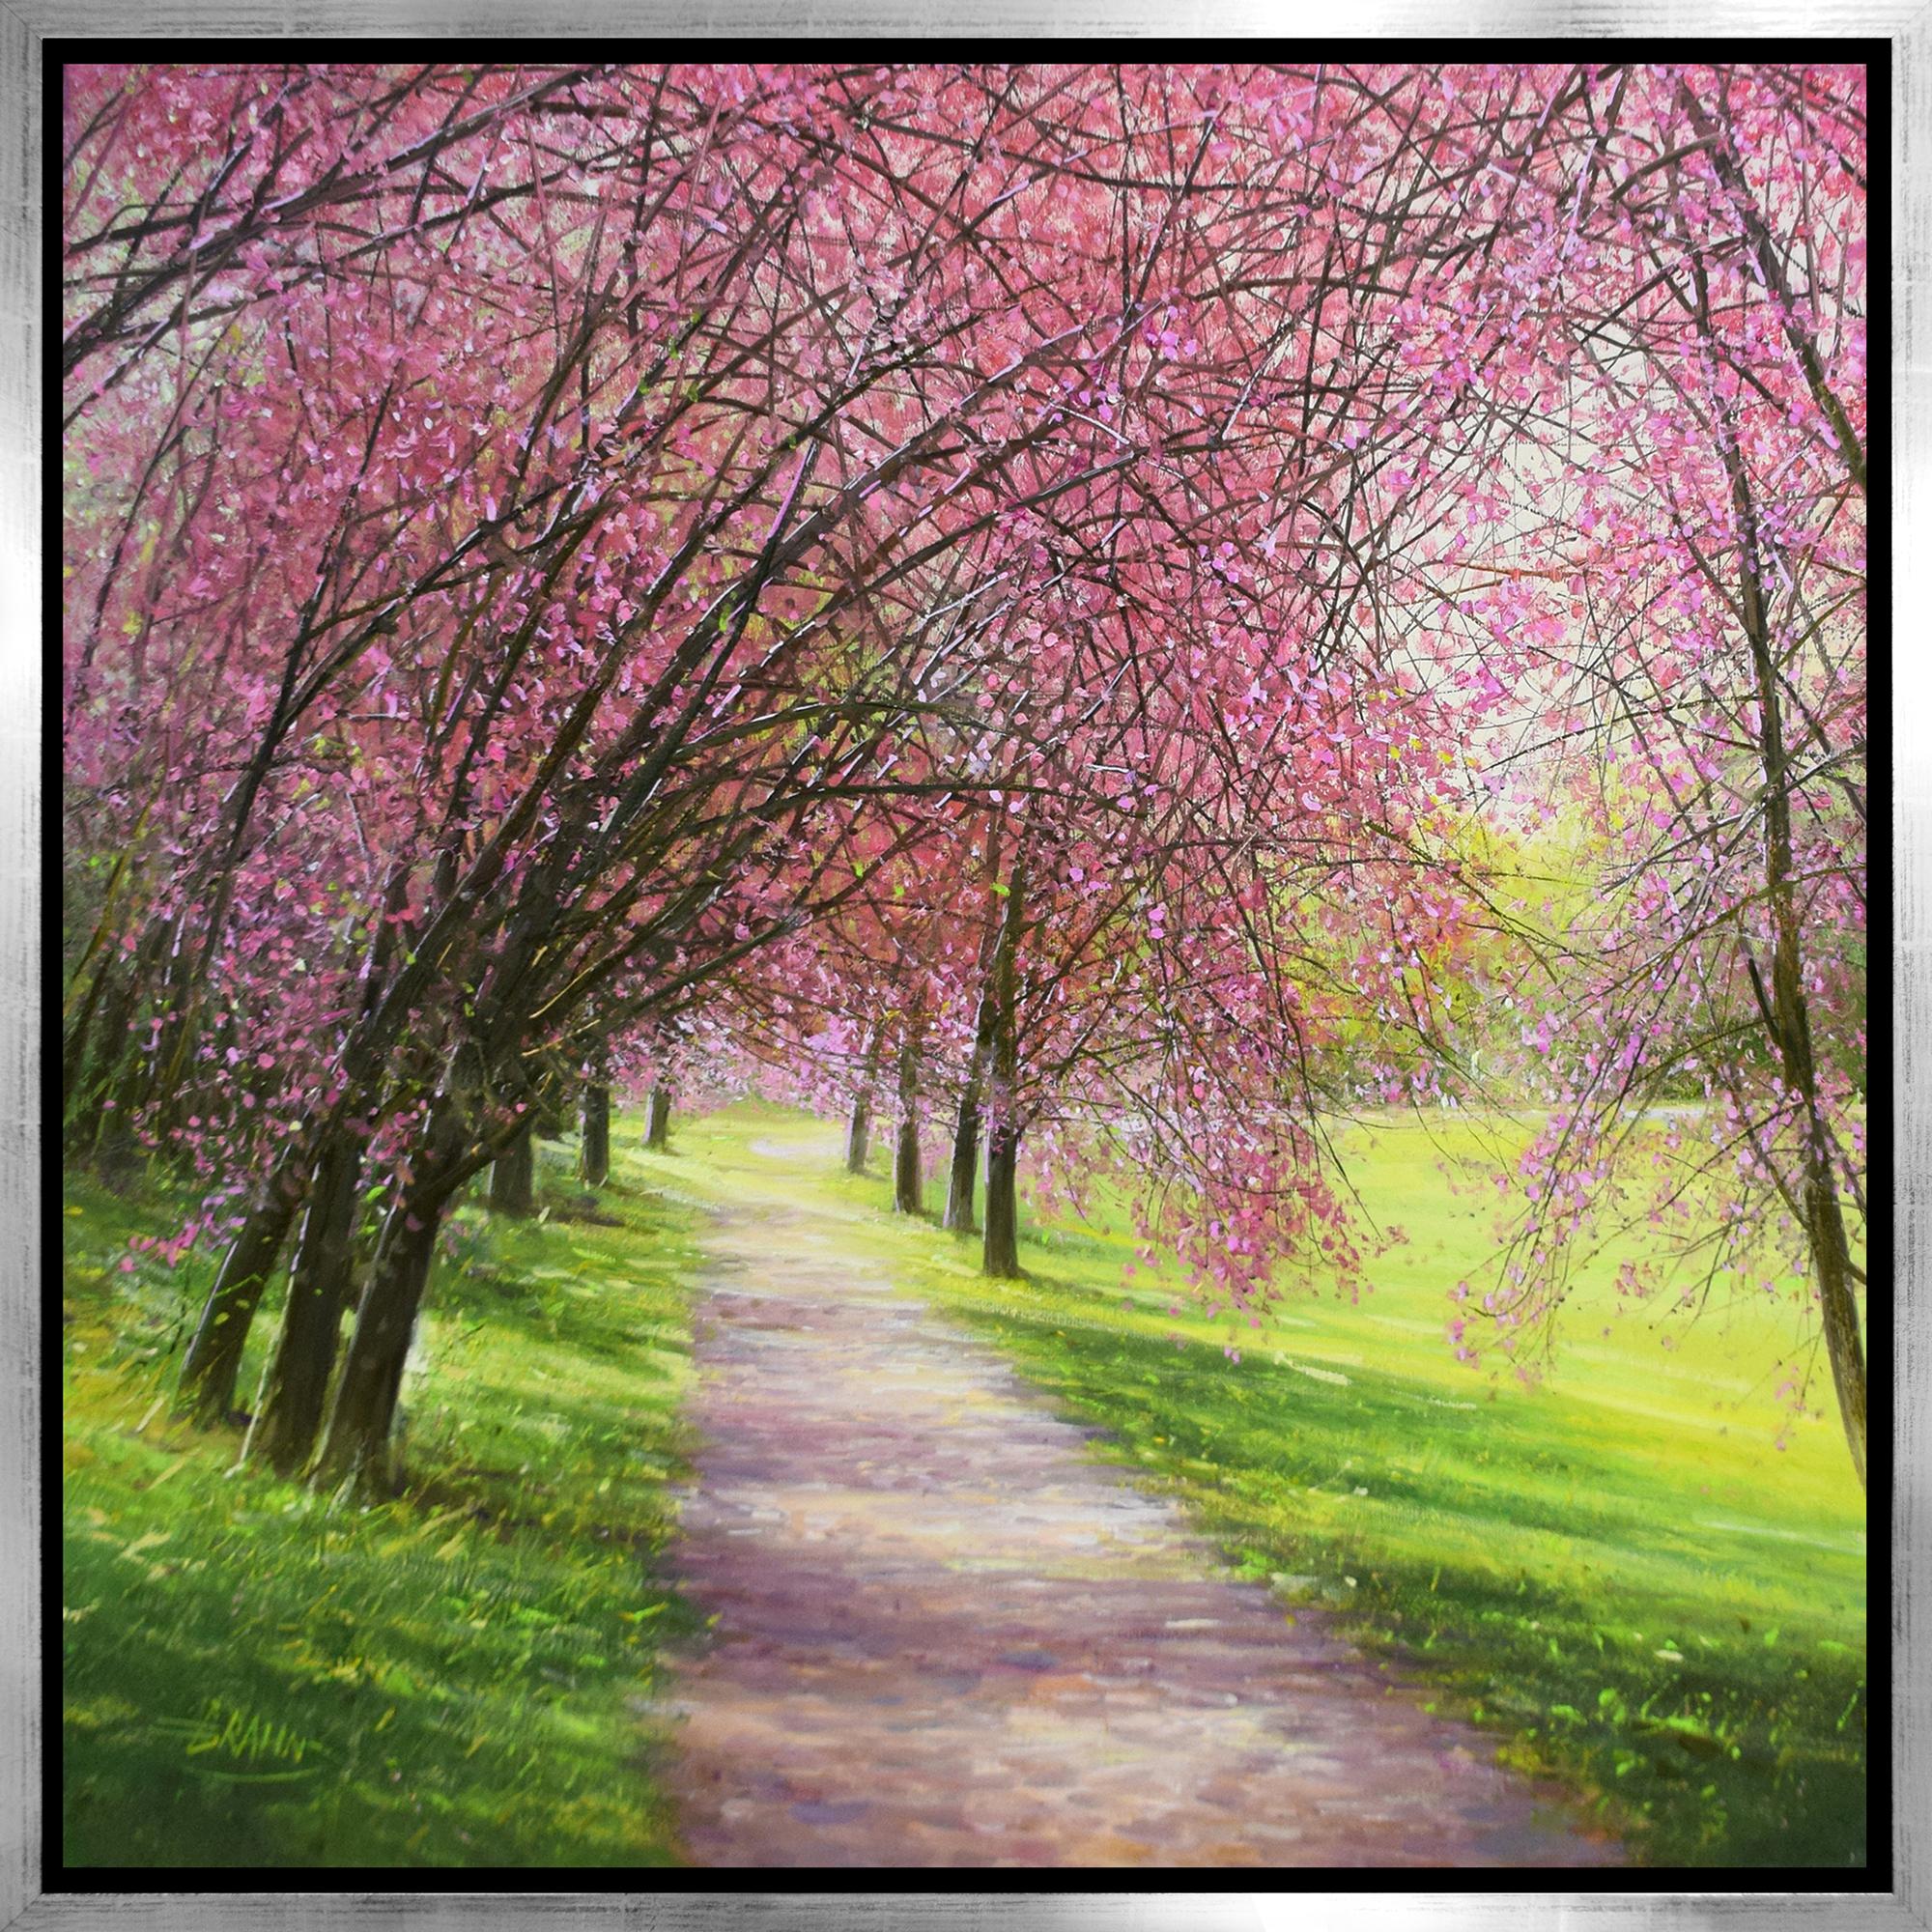 Detlef Rahn - Central Park , 7840-006-991